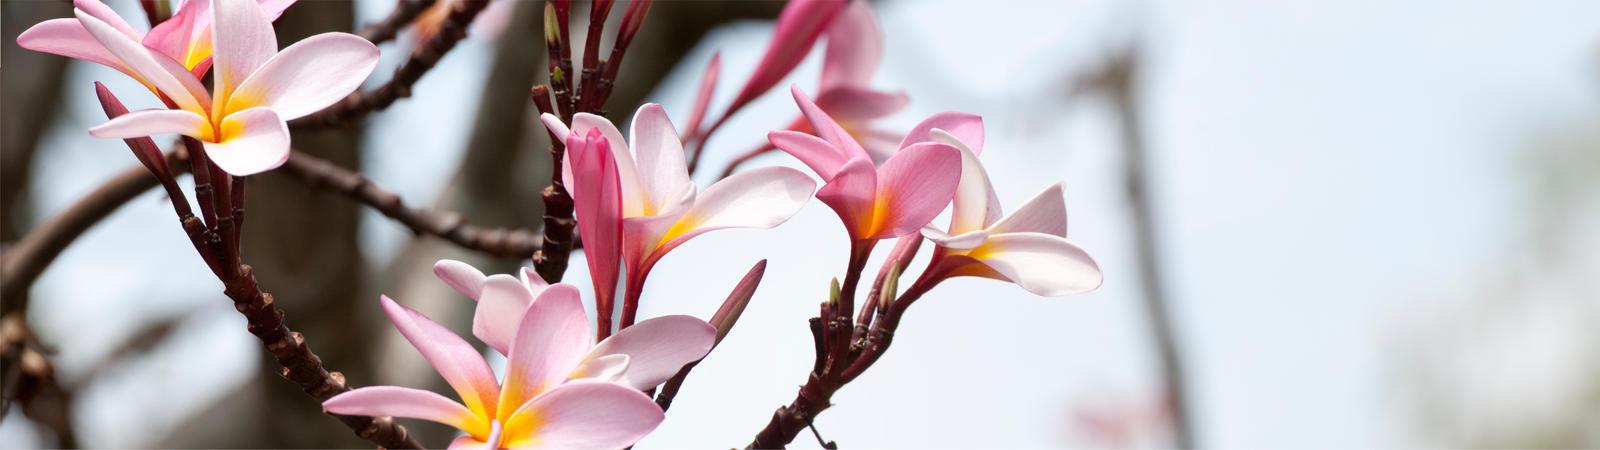 Pink Flowers by Bathlamos